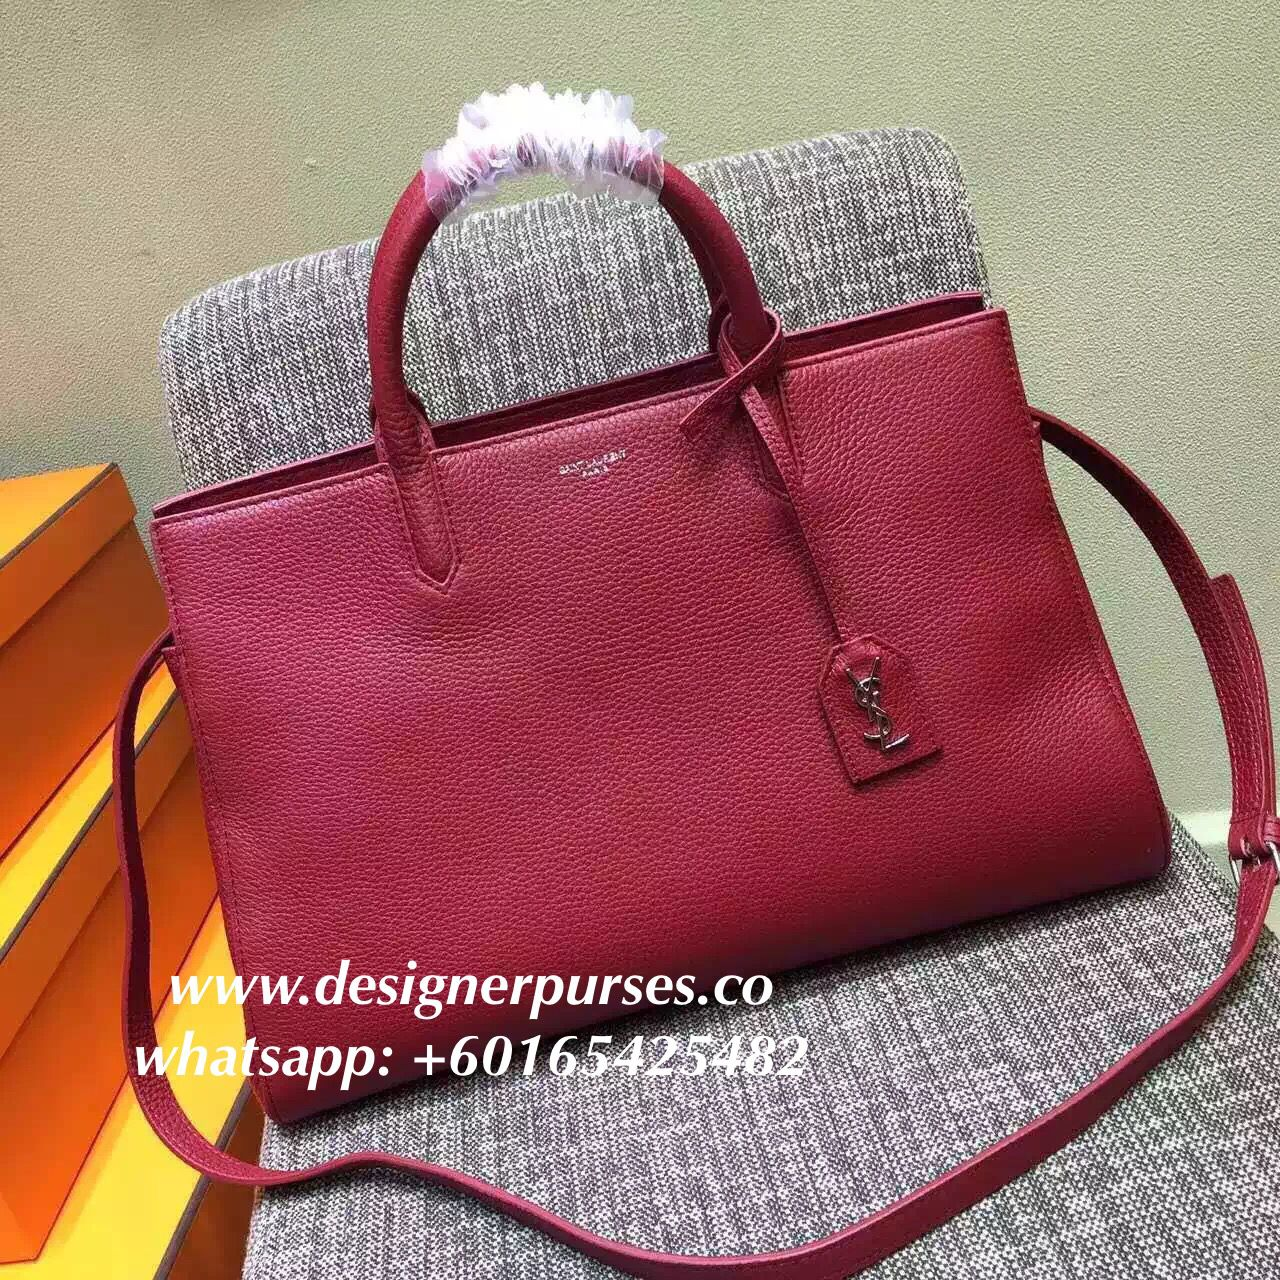 81c2d319d71f YSL cabas rive gauche bag#louisvuitton #Prada #Hermes #chanel #Burberry #